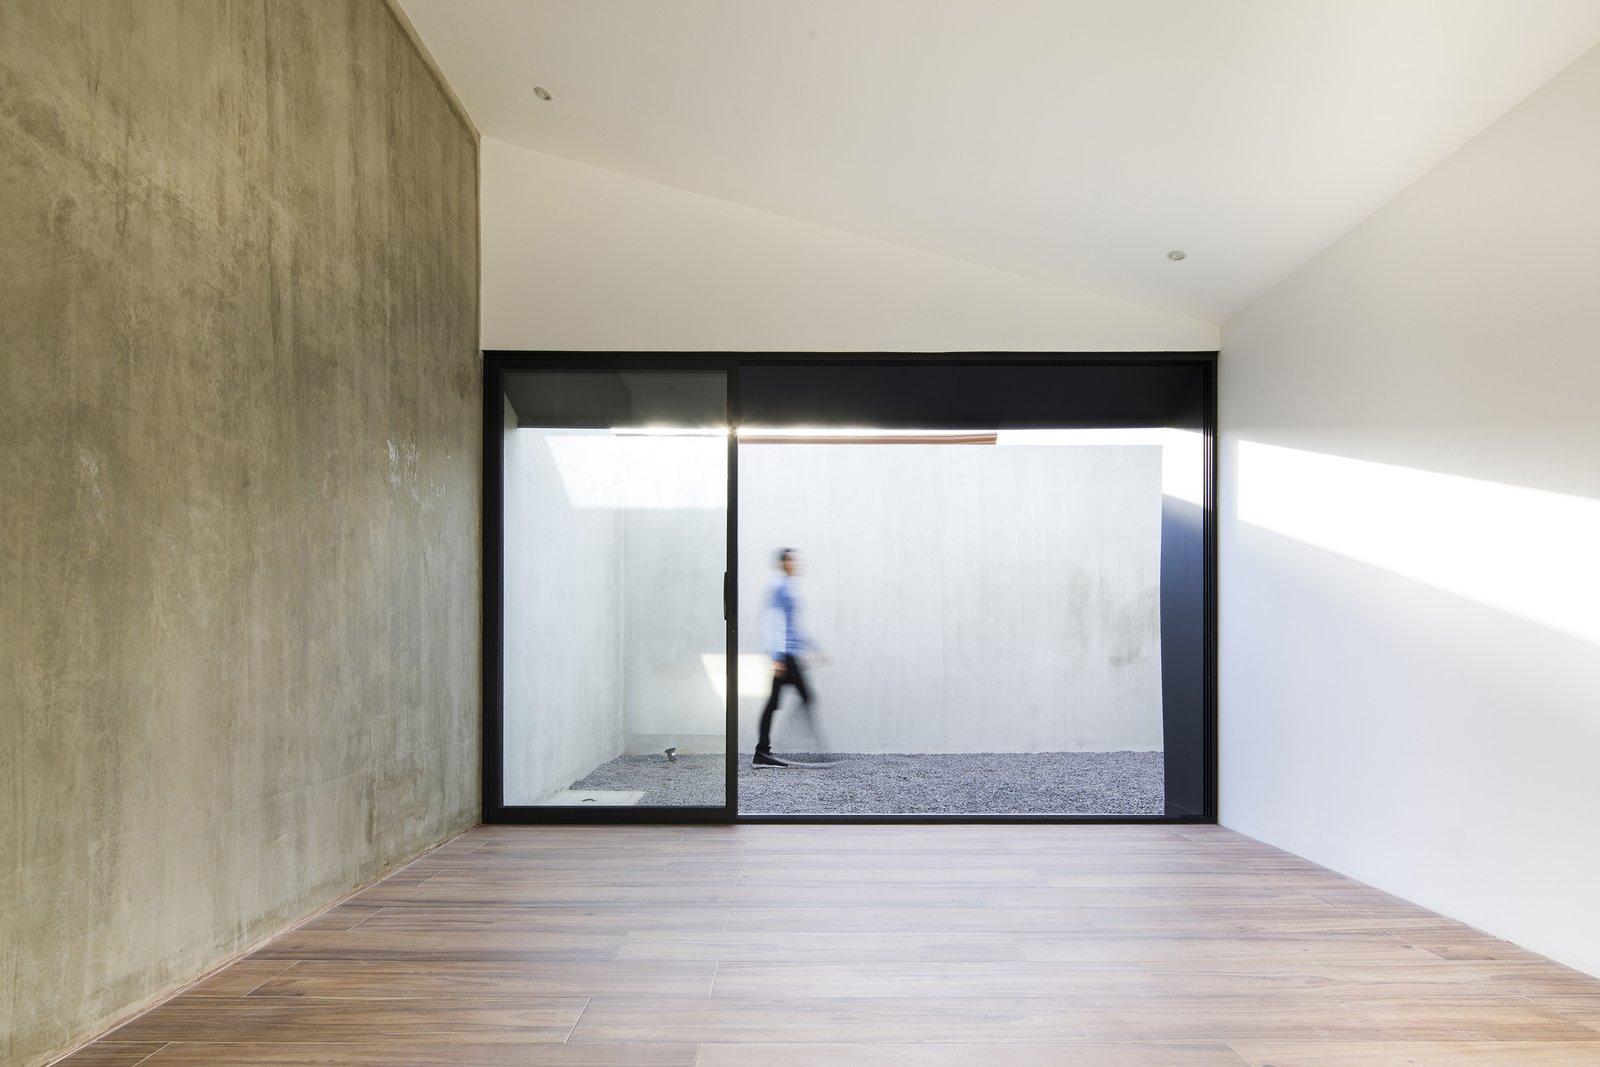 Bedroom, Ceiling Lighting, and Porcelain Tile Floor  Casa Ching by MG design studio